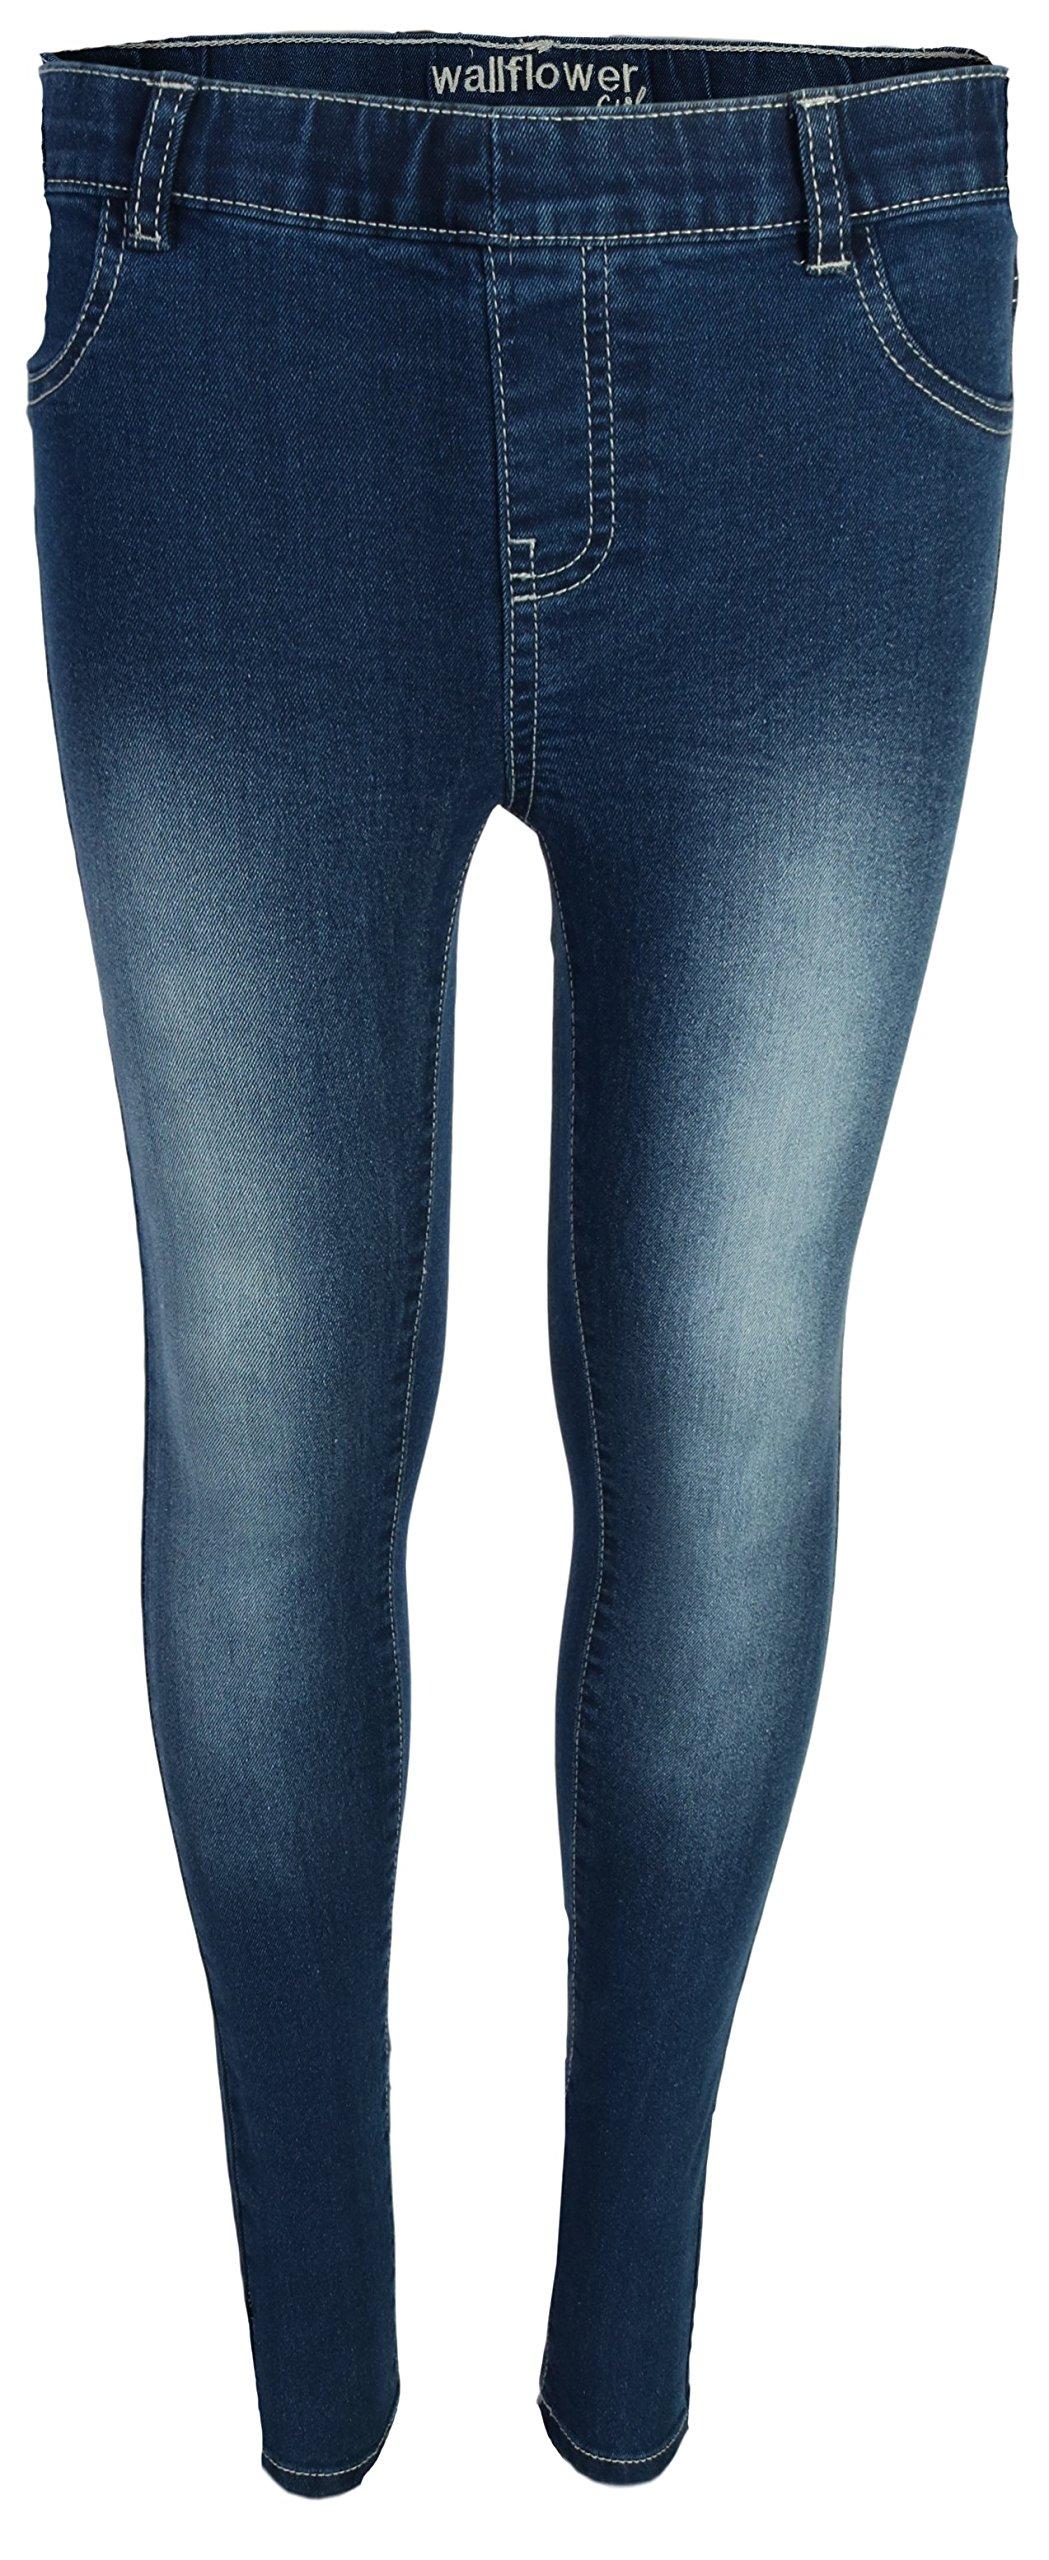 WallFlower Jeans Girls Soft Denim Stretchy Jeggings, Medium Wash, Size 14/16'